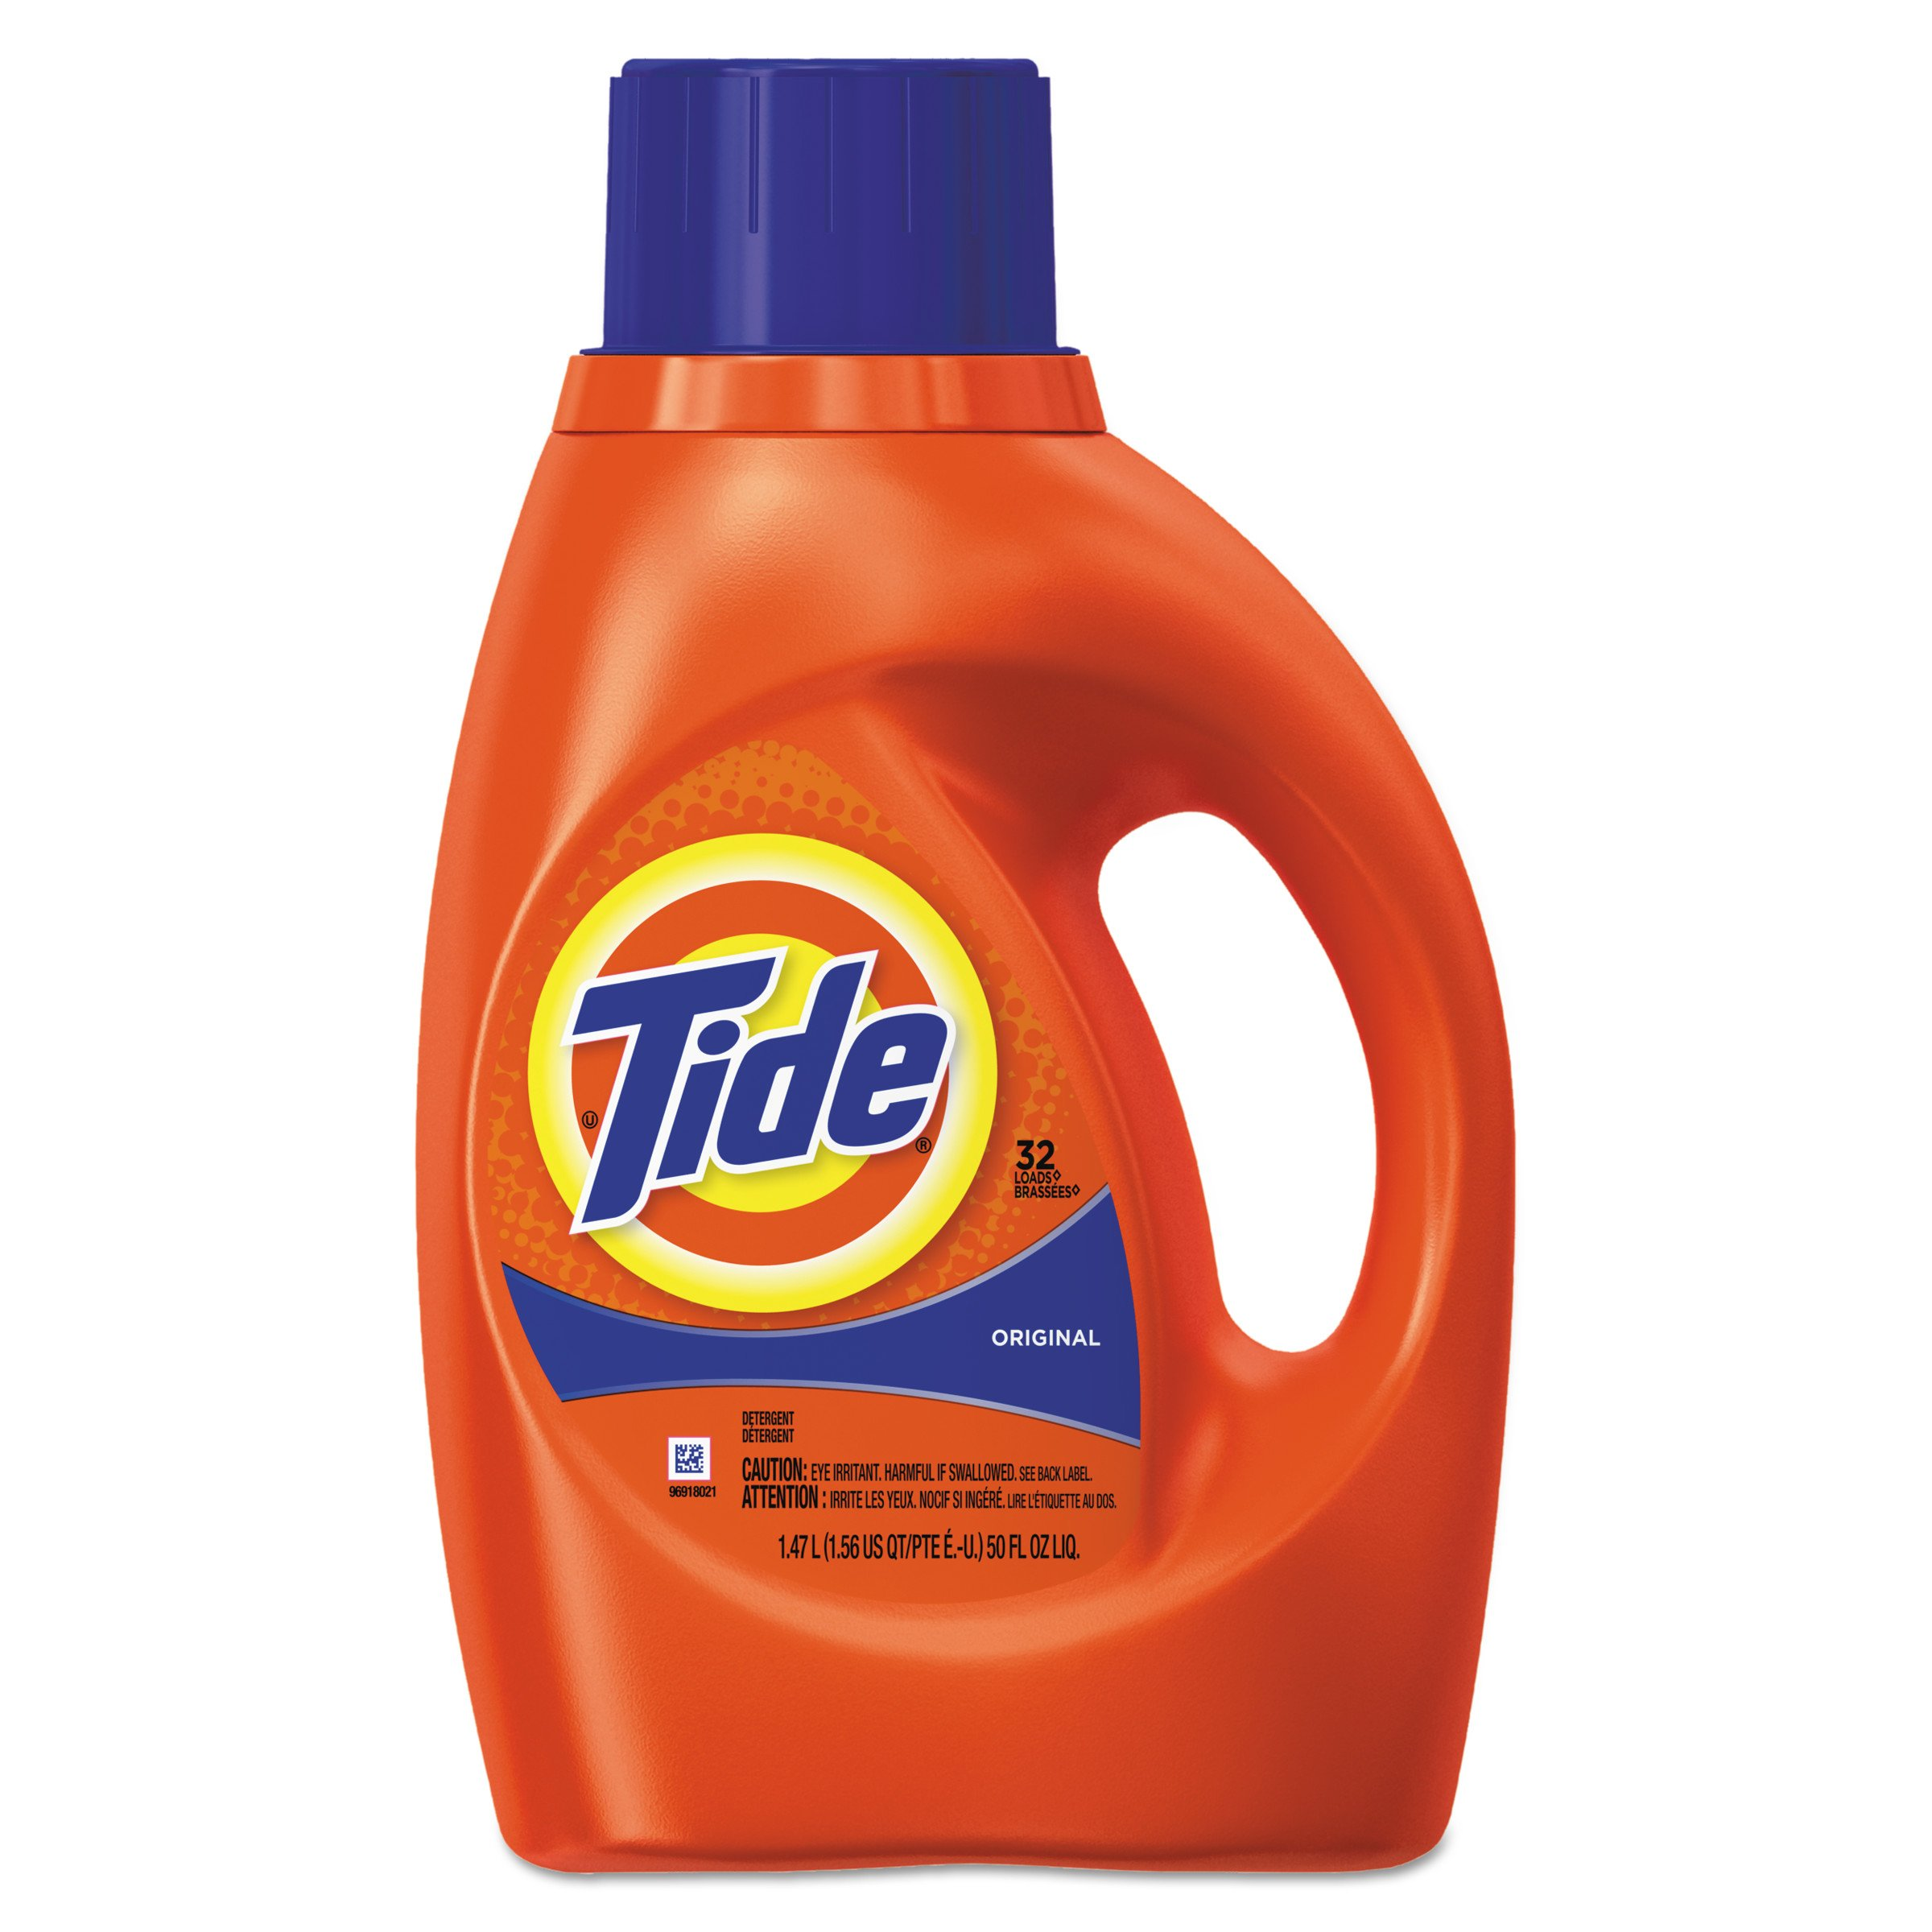 Tide 13878CT Ultra Liquid Tide Laundry Detergent, 32 loads, 50 oz Bottle (Case of 6)